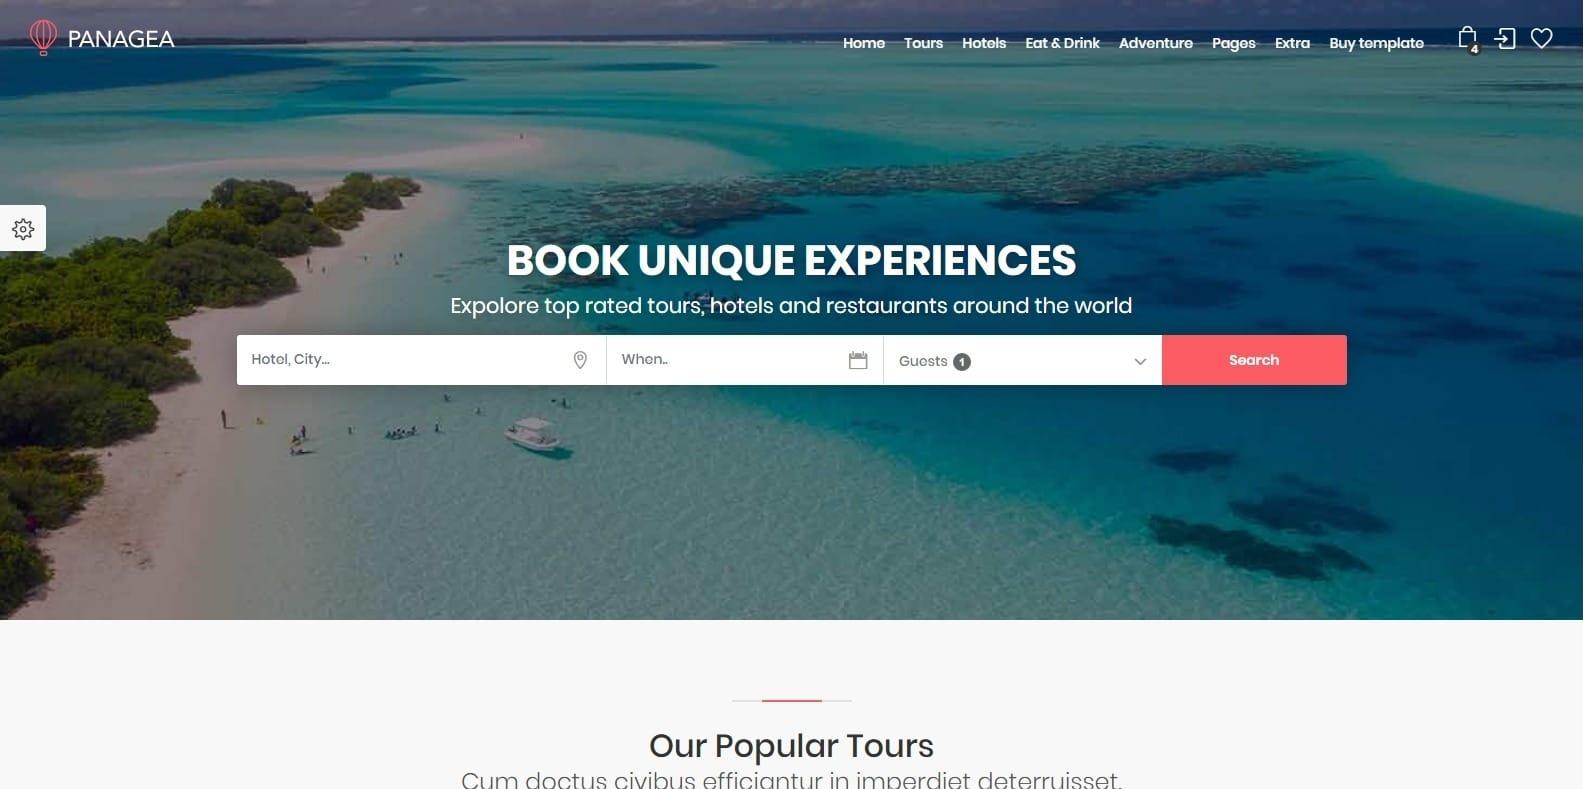 panagea-travel-website-template